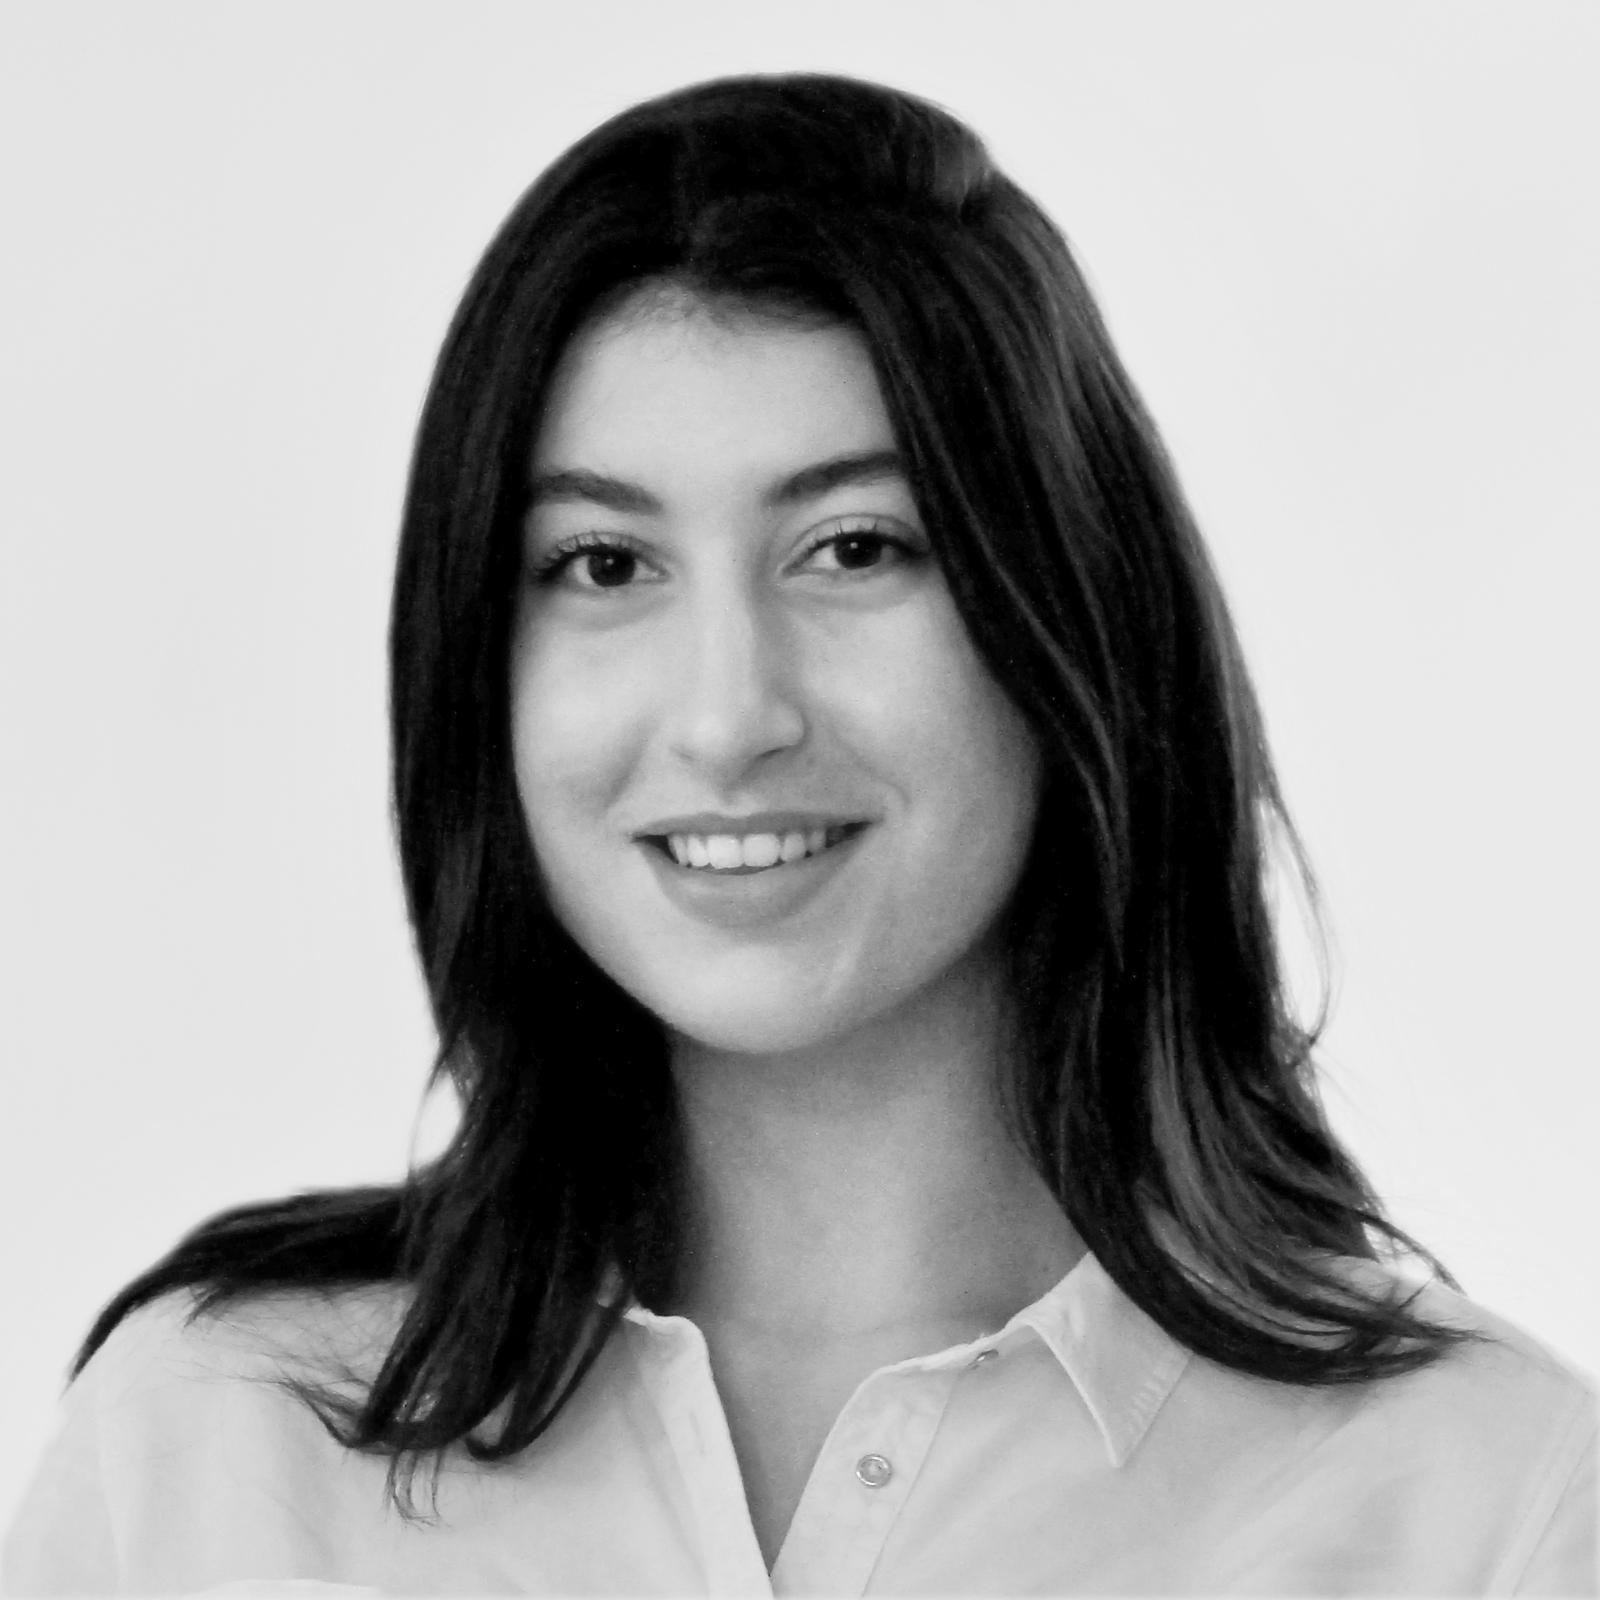 http://staging.ksrarchitects.com/wp-content/uploads/2021/06/Katarina-Manojlovic.jpg